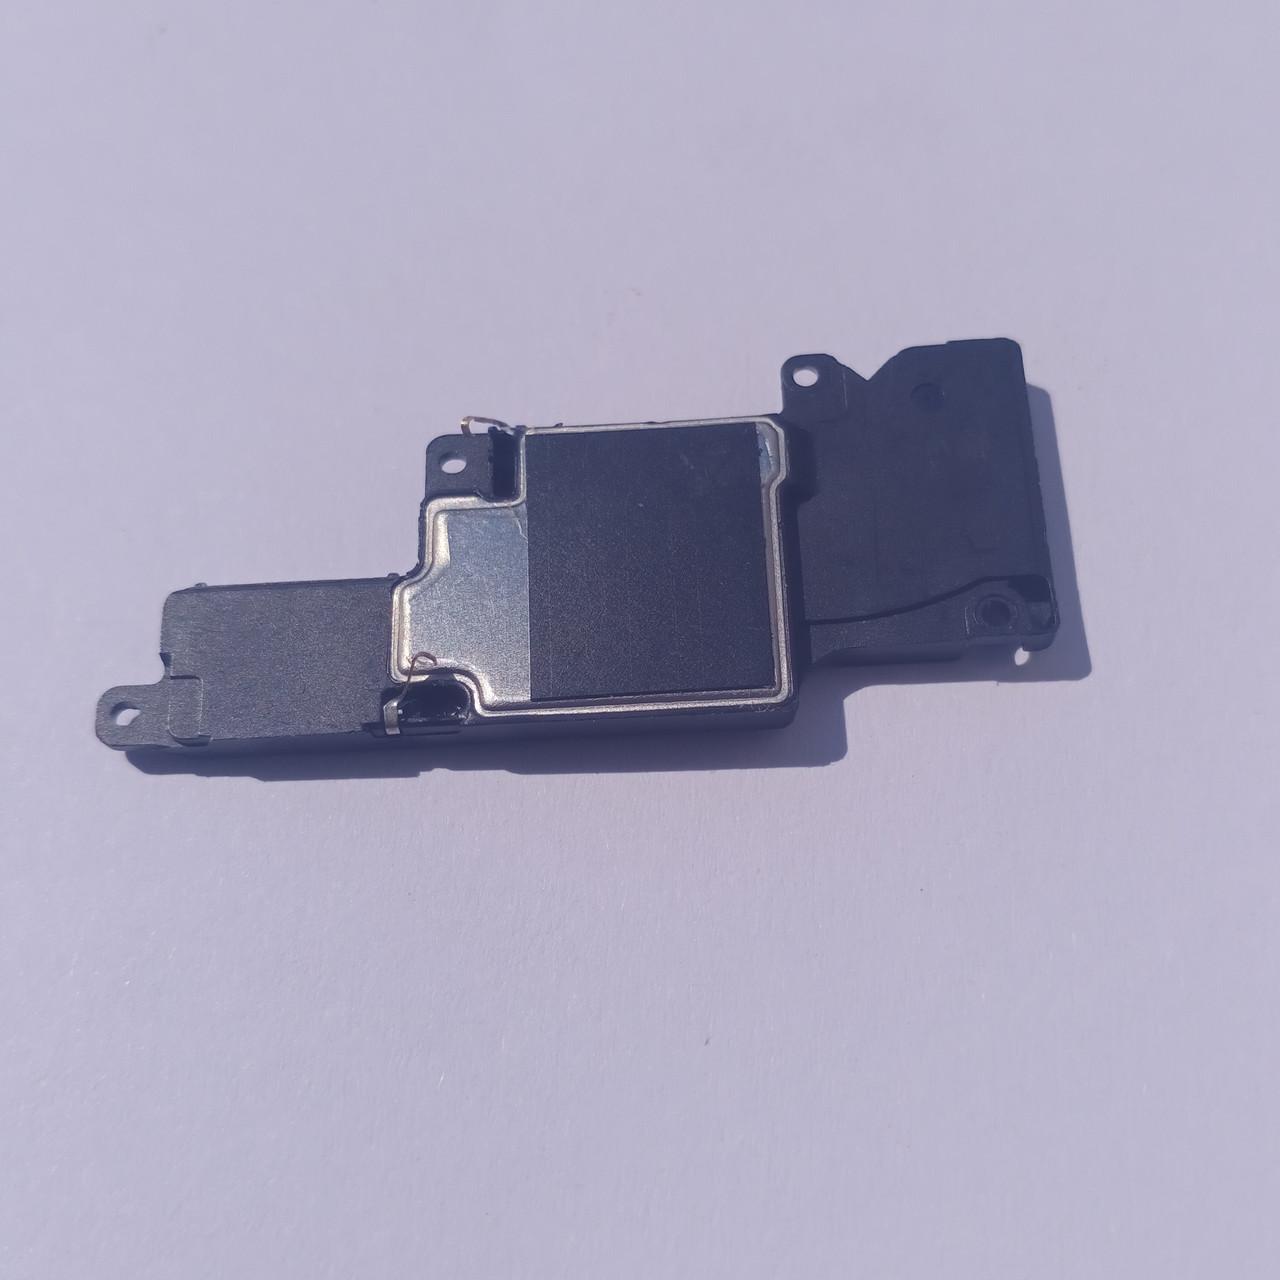 Звонок Novacel для Apple iPhone 6 Plus